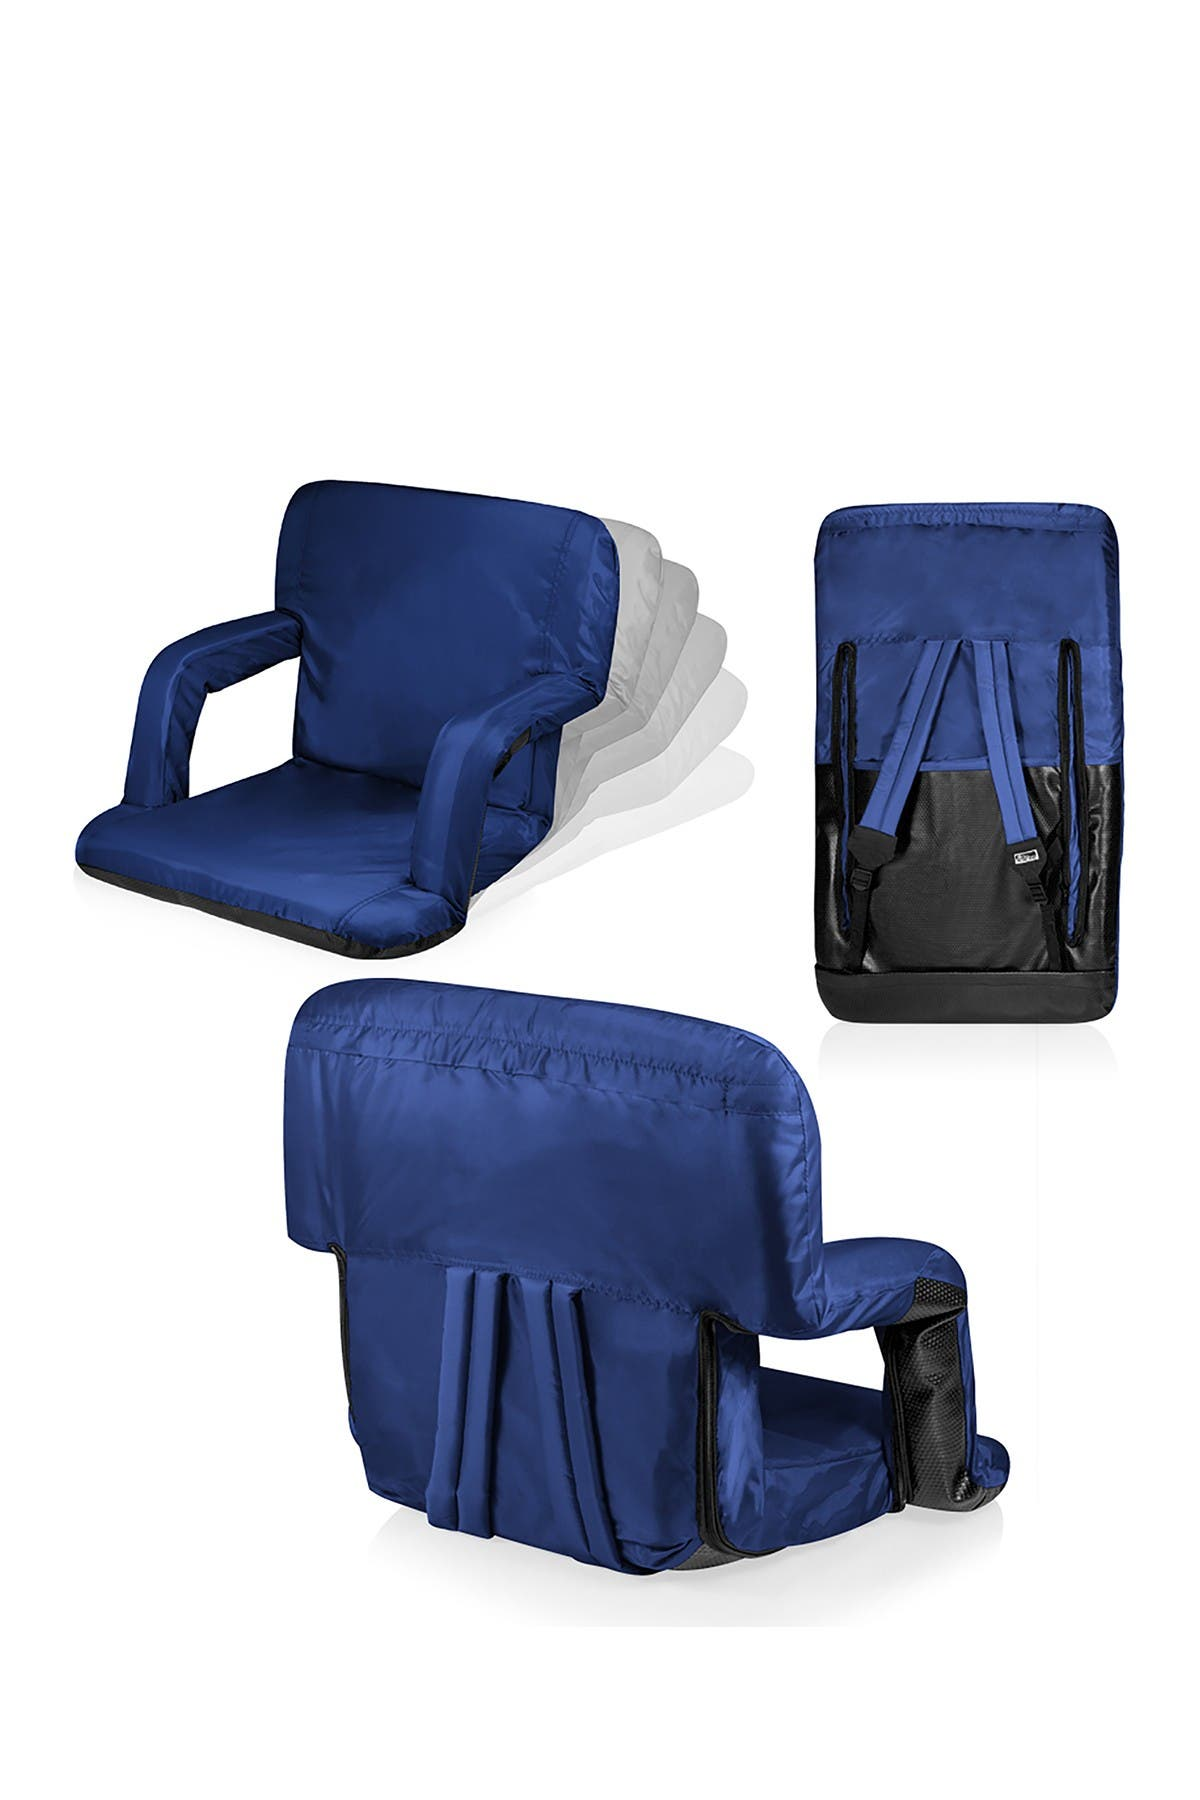 Image of ONIVA Blue Ventura Seat